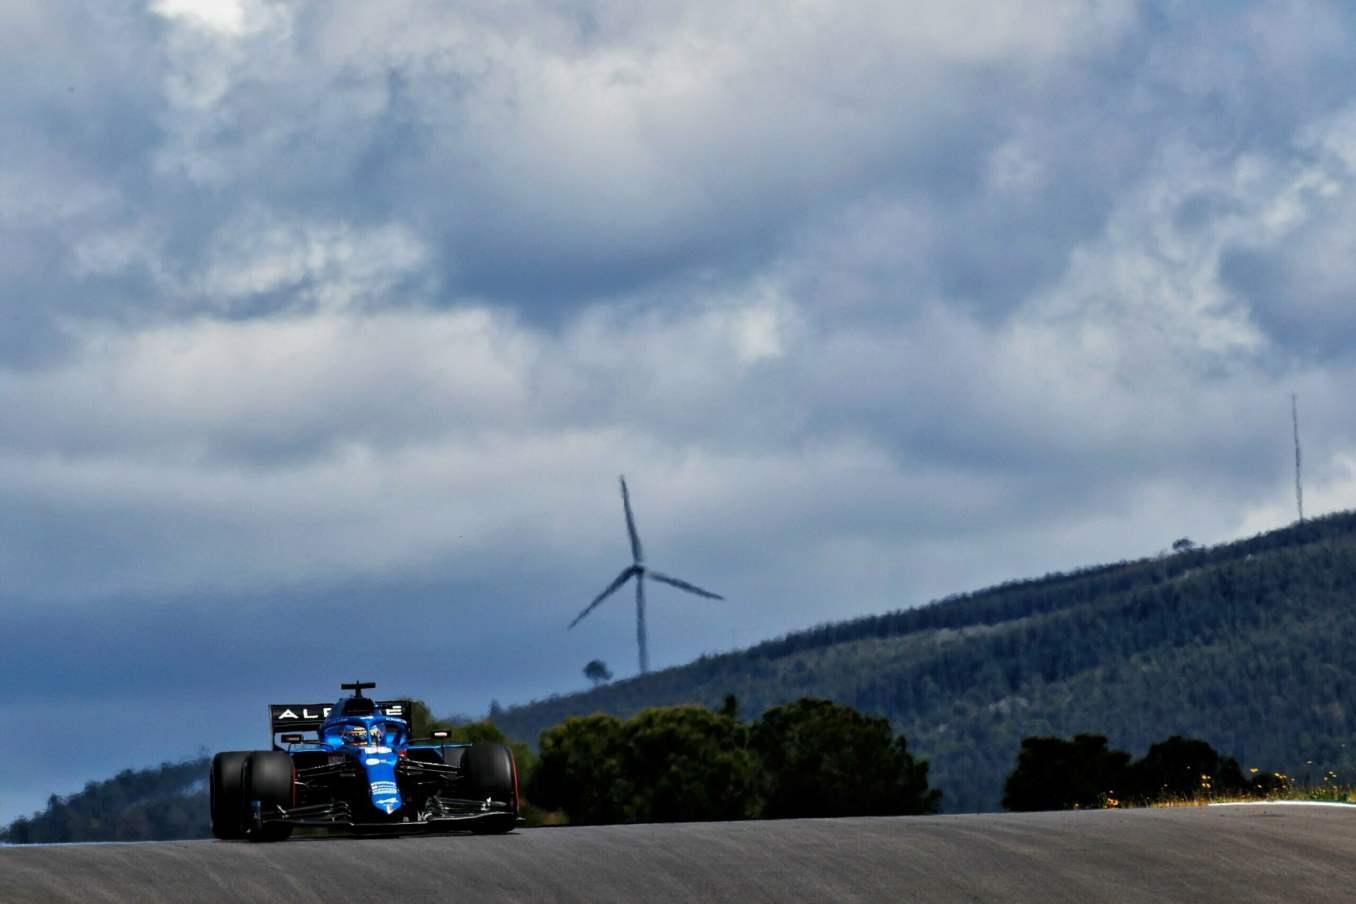 Alpine F1 Team GRAND PRIX HEINEKEN DU PORTUGAL Alonso Ocon 2021 A521 6 scaled   Alpine F1 Team : des essais convaincants au Grand Prix Heineken du Portugal